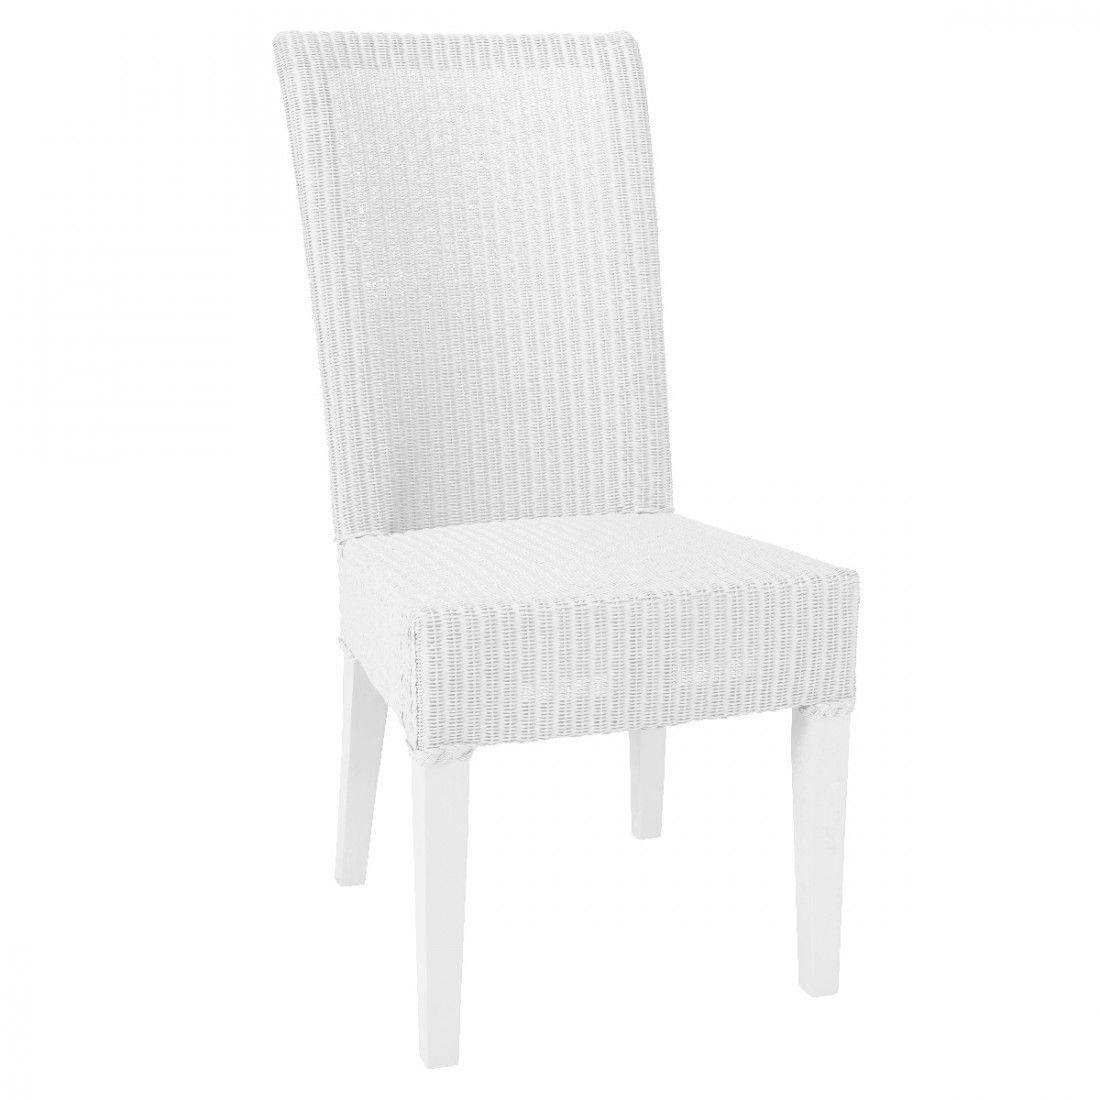 Chaise Lloyd Loom Josephine Laque Blanc Furniture Coastal Furniture Accent Chairs